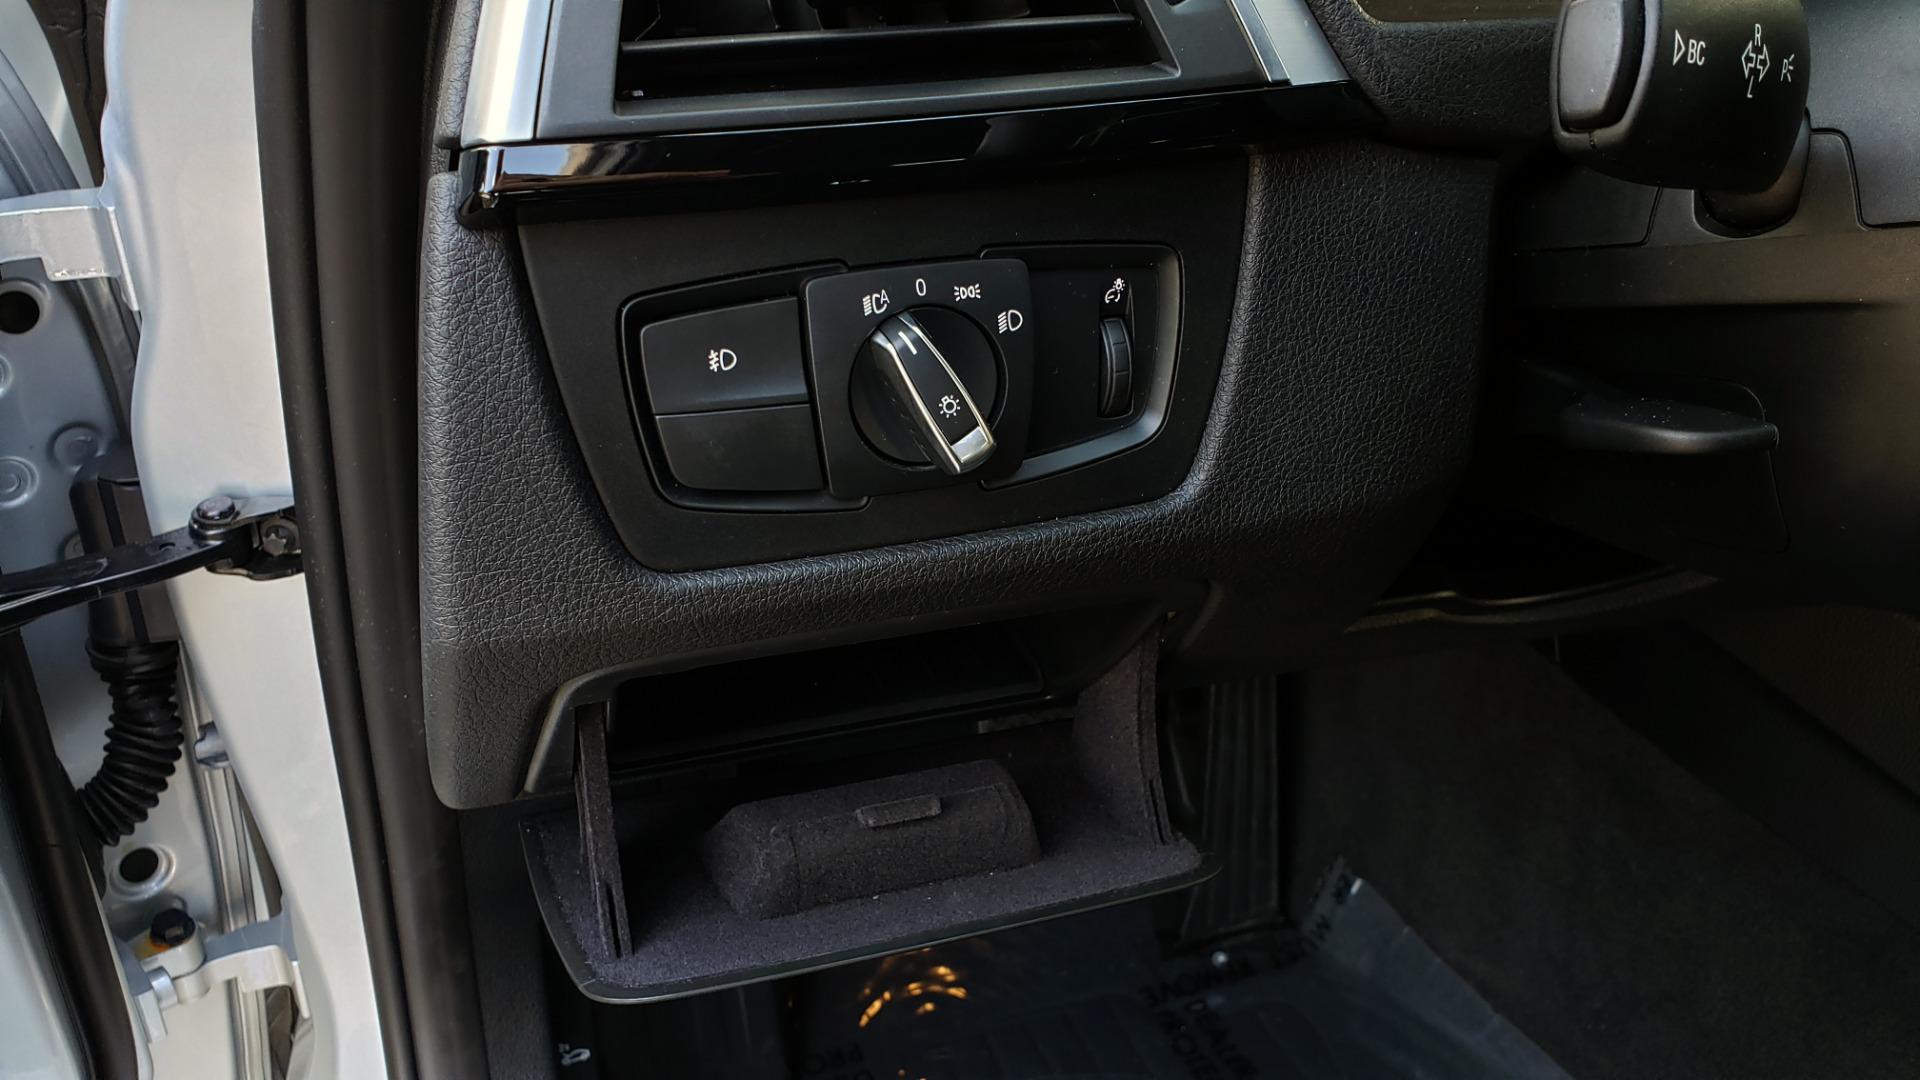 Used 2017 BMW 3 SERIES 330I SPORT SEDAN / DRVR ASST PKG / SUNROOF / REARVIEW for sale Sold at Formula Imports in Charlotte NC 28227 38